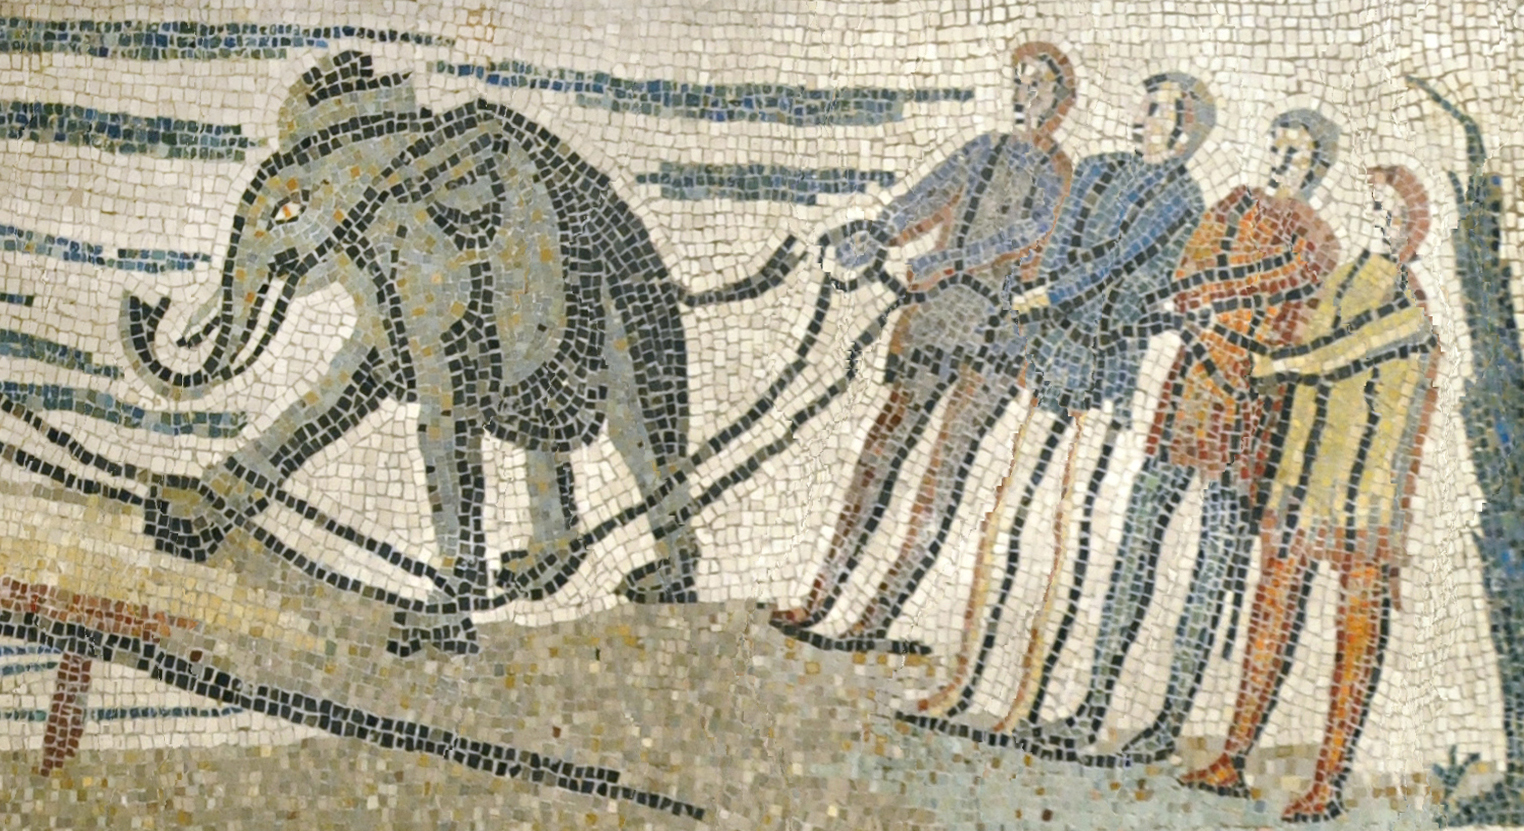 Sangre en la arena: animales en la antigua Roma